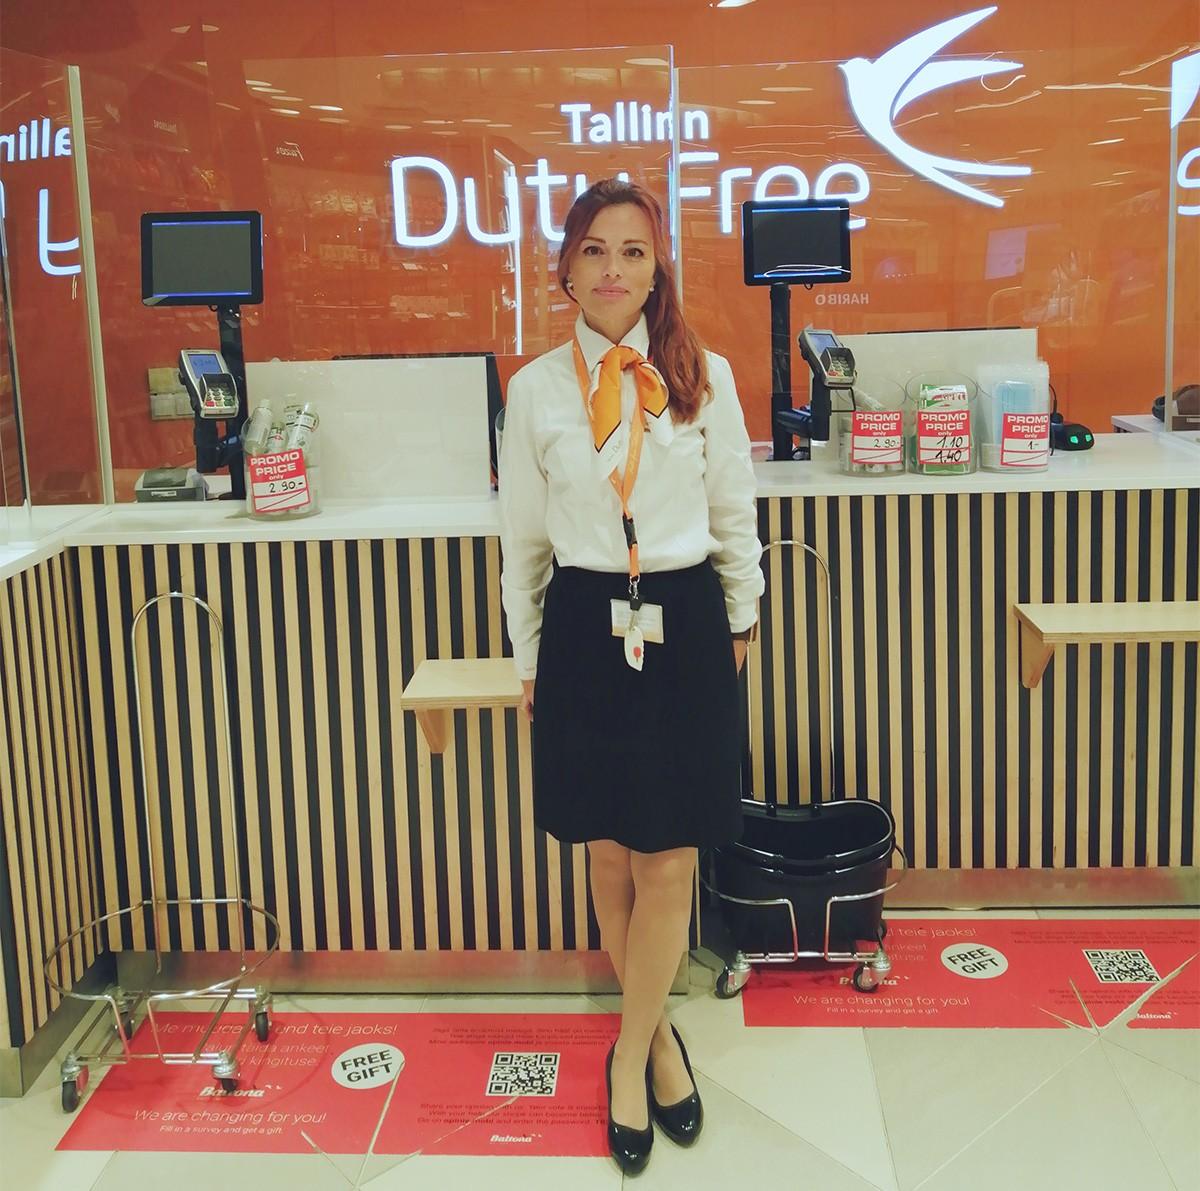 Núria Alonso Masferrer treballa a l'aeroport de Tallinn (Estònia).